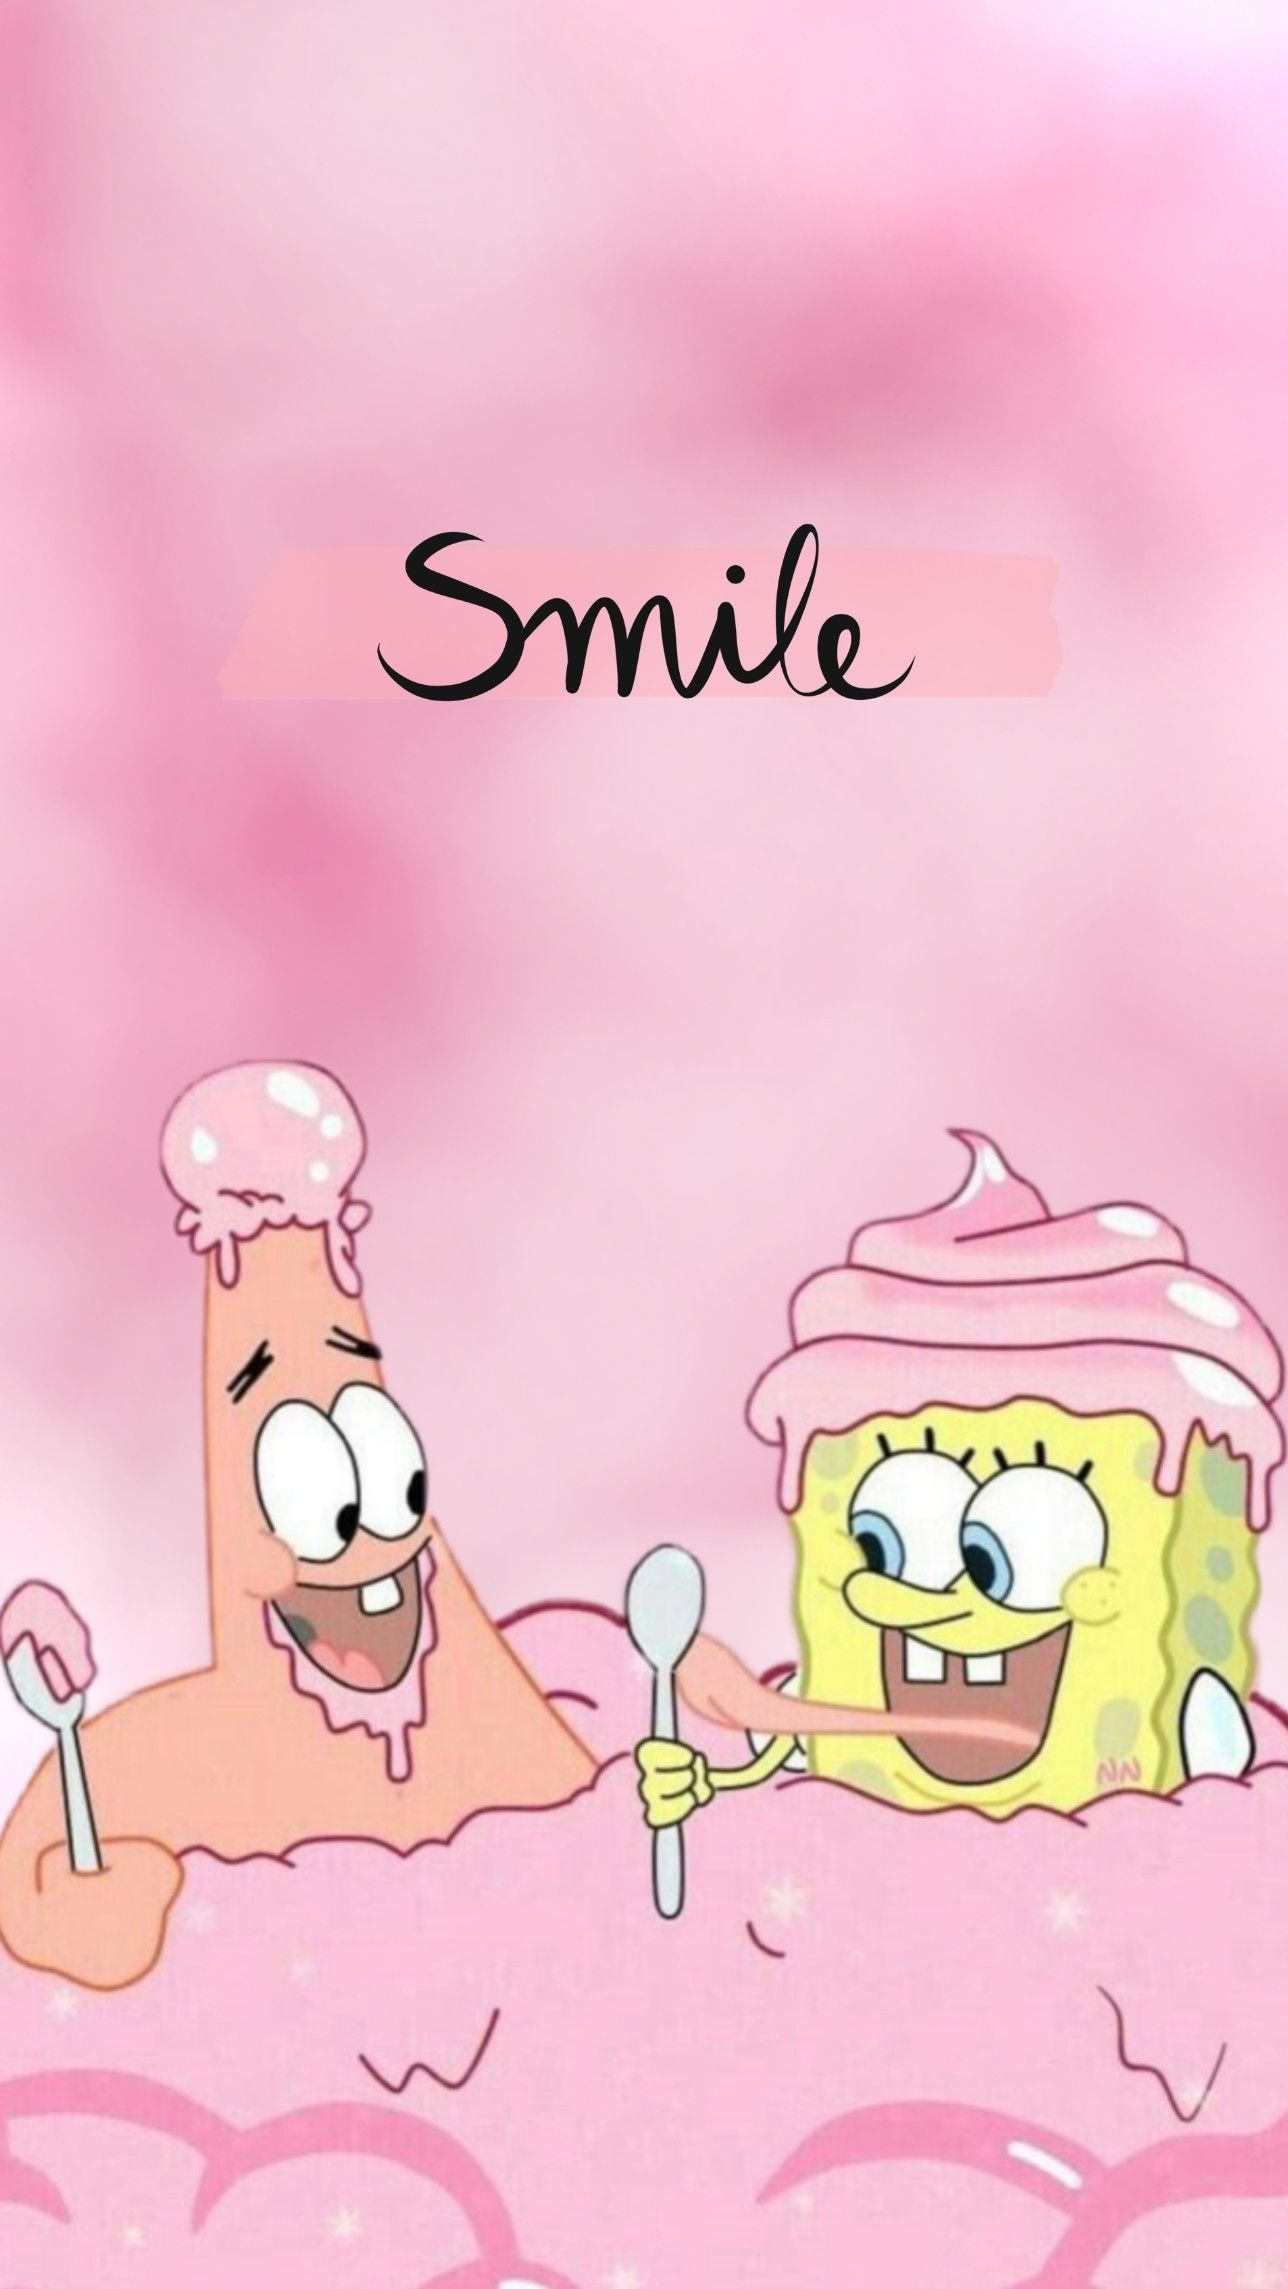 Wallpaper Sponge Bob And Patrick Pink Cartoon Wallpaper Iphone Spongebob Wallpaper Pink Wallpaper Iphone